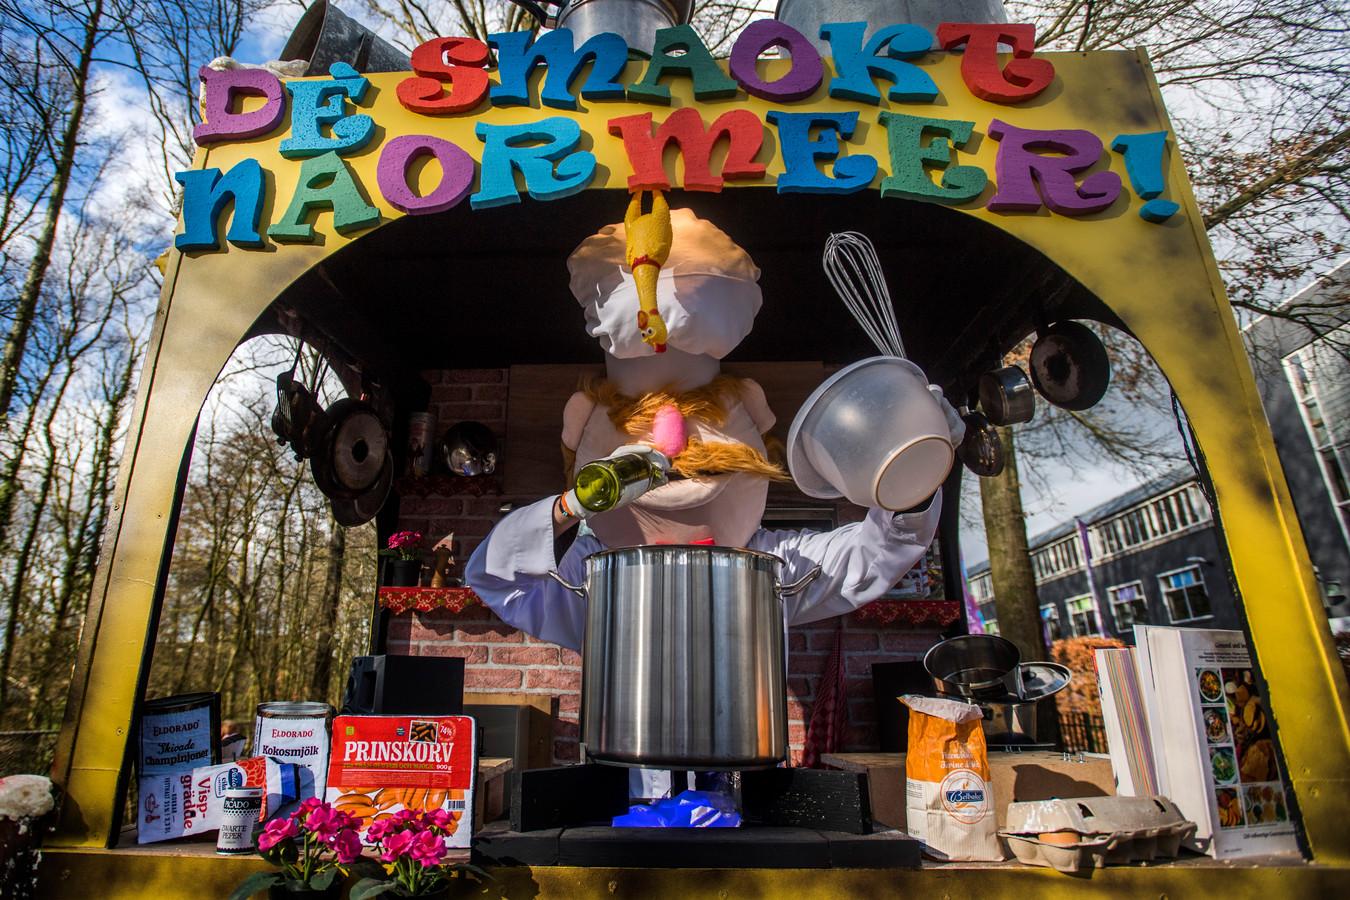 OISTERWIJK Carnavalsoptocht nr 33 Brandweer Oisterwijk - The Muppet Show